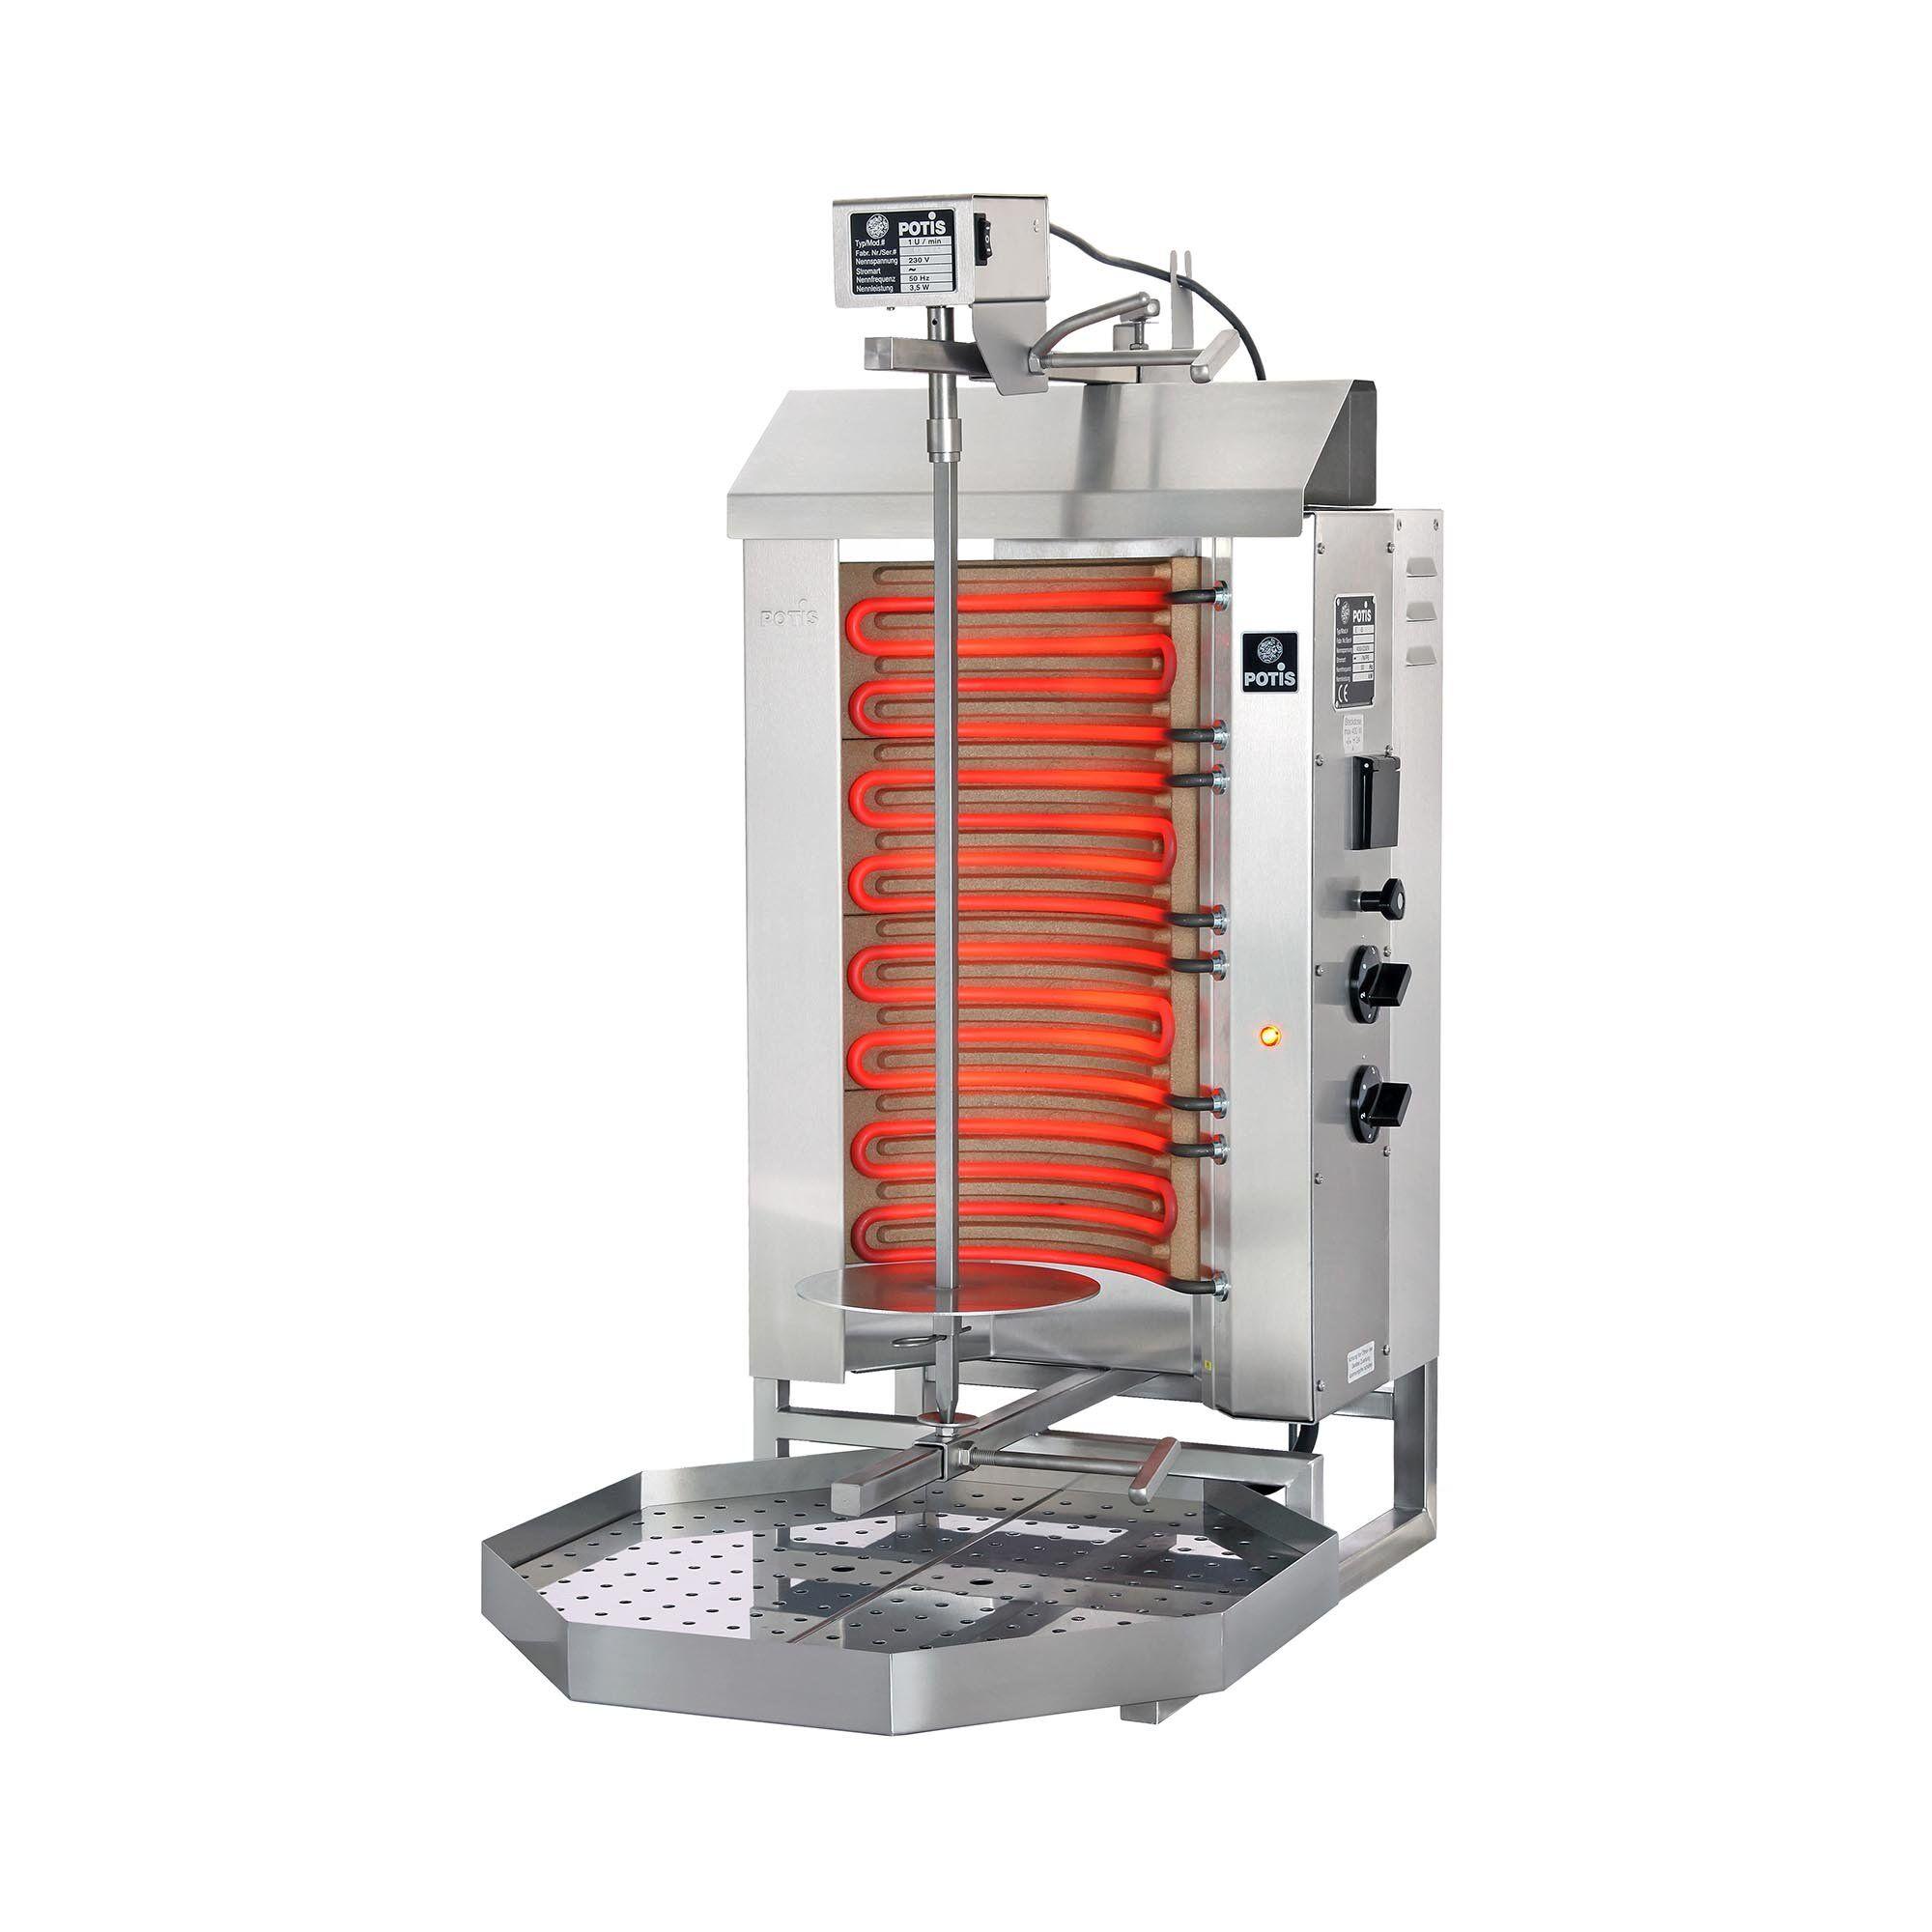 POTIS Dönergrill - 6.000 W - elektrisk POTIS E2-S